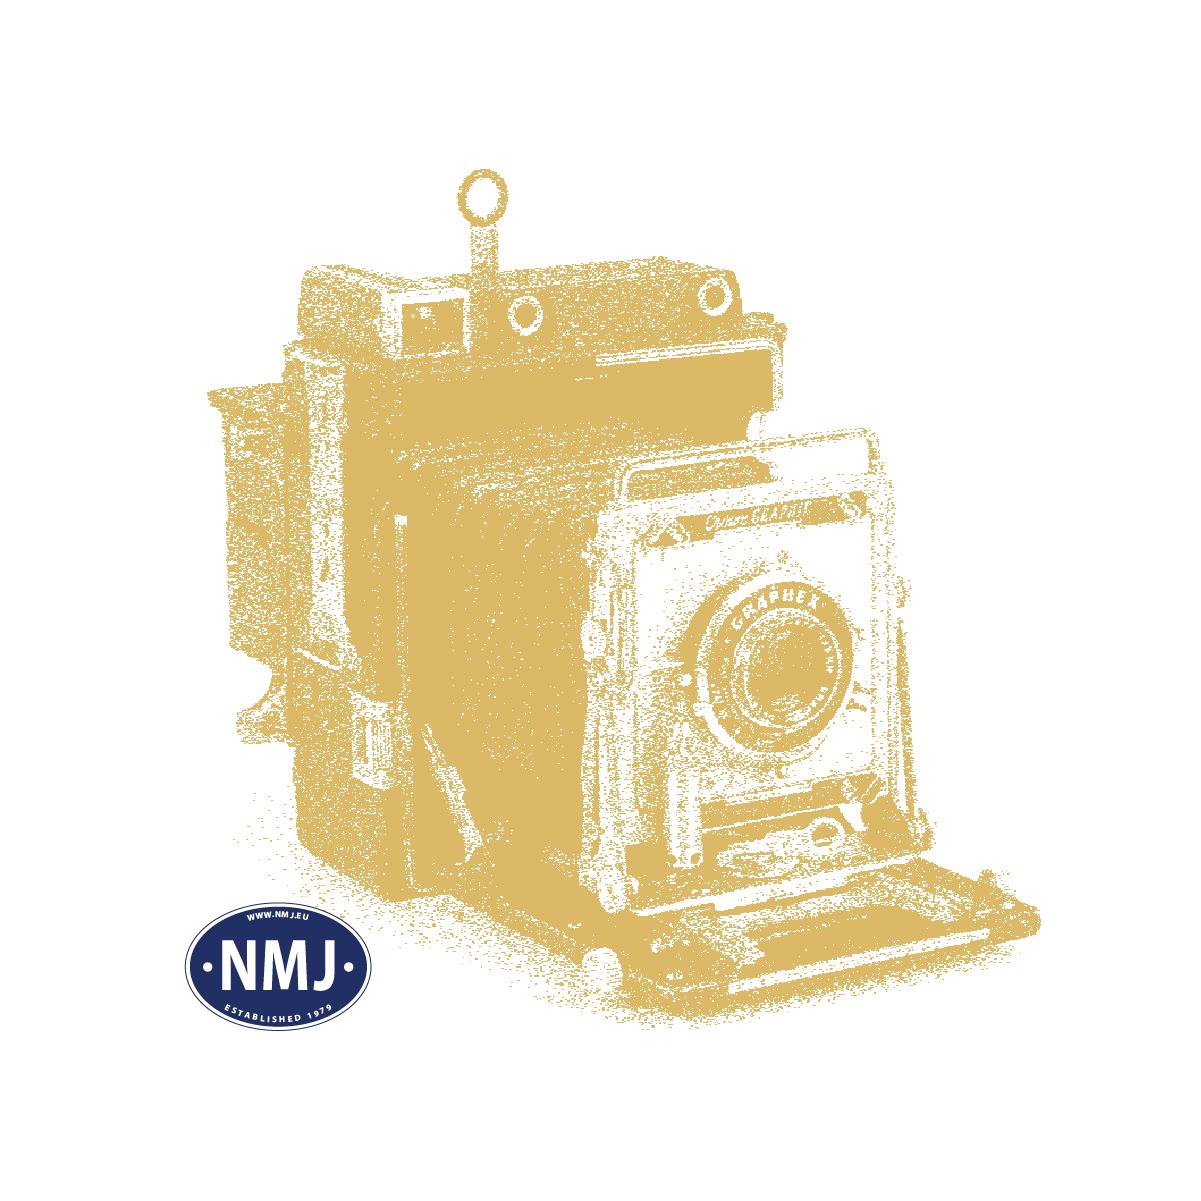 MBR50-5003 - Sträucher, gelb blühend, 15x15 cm